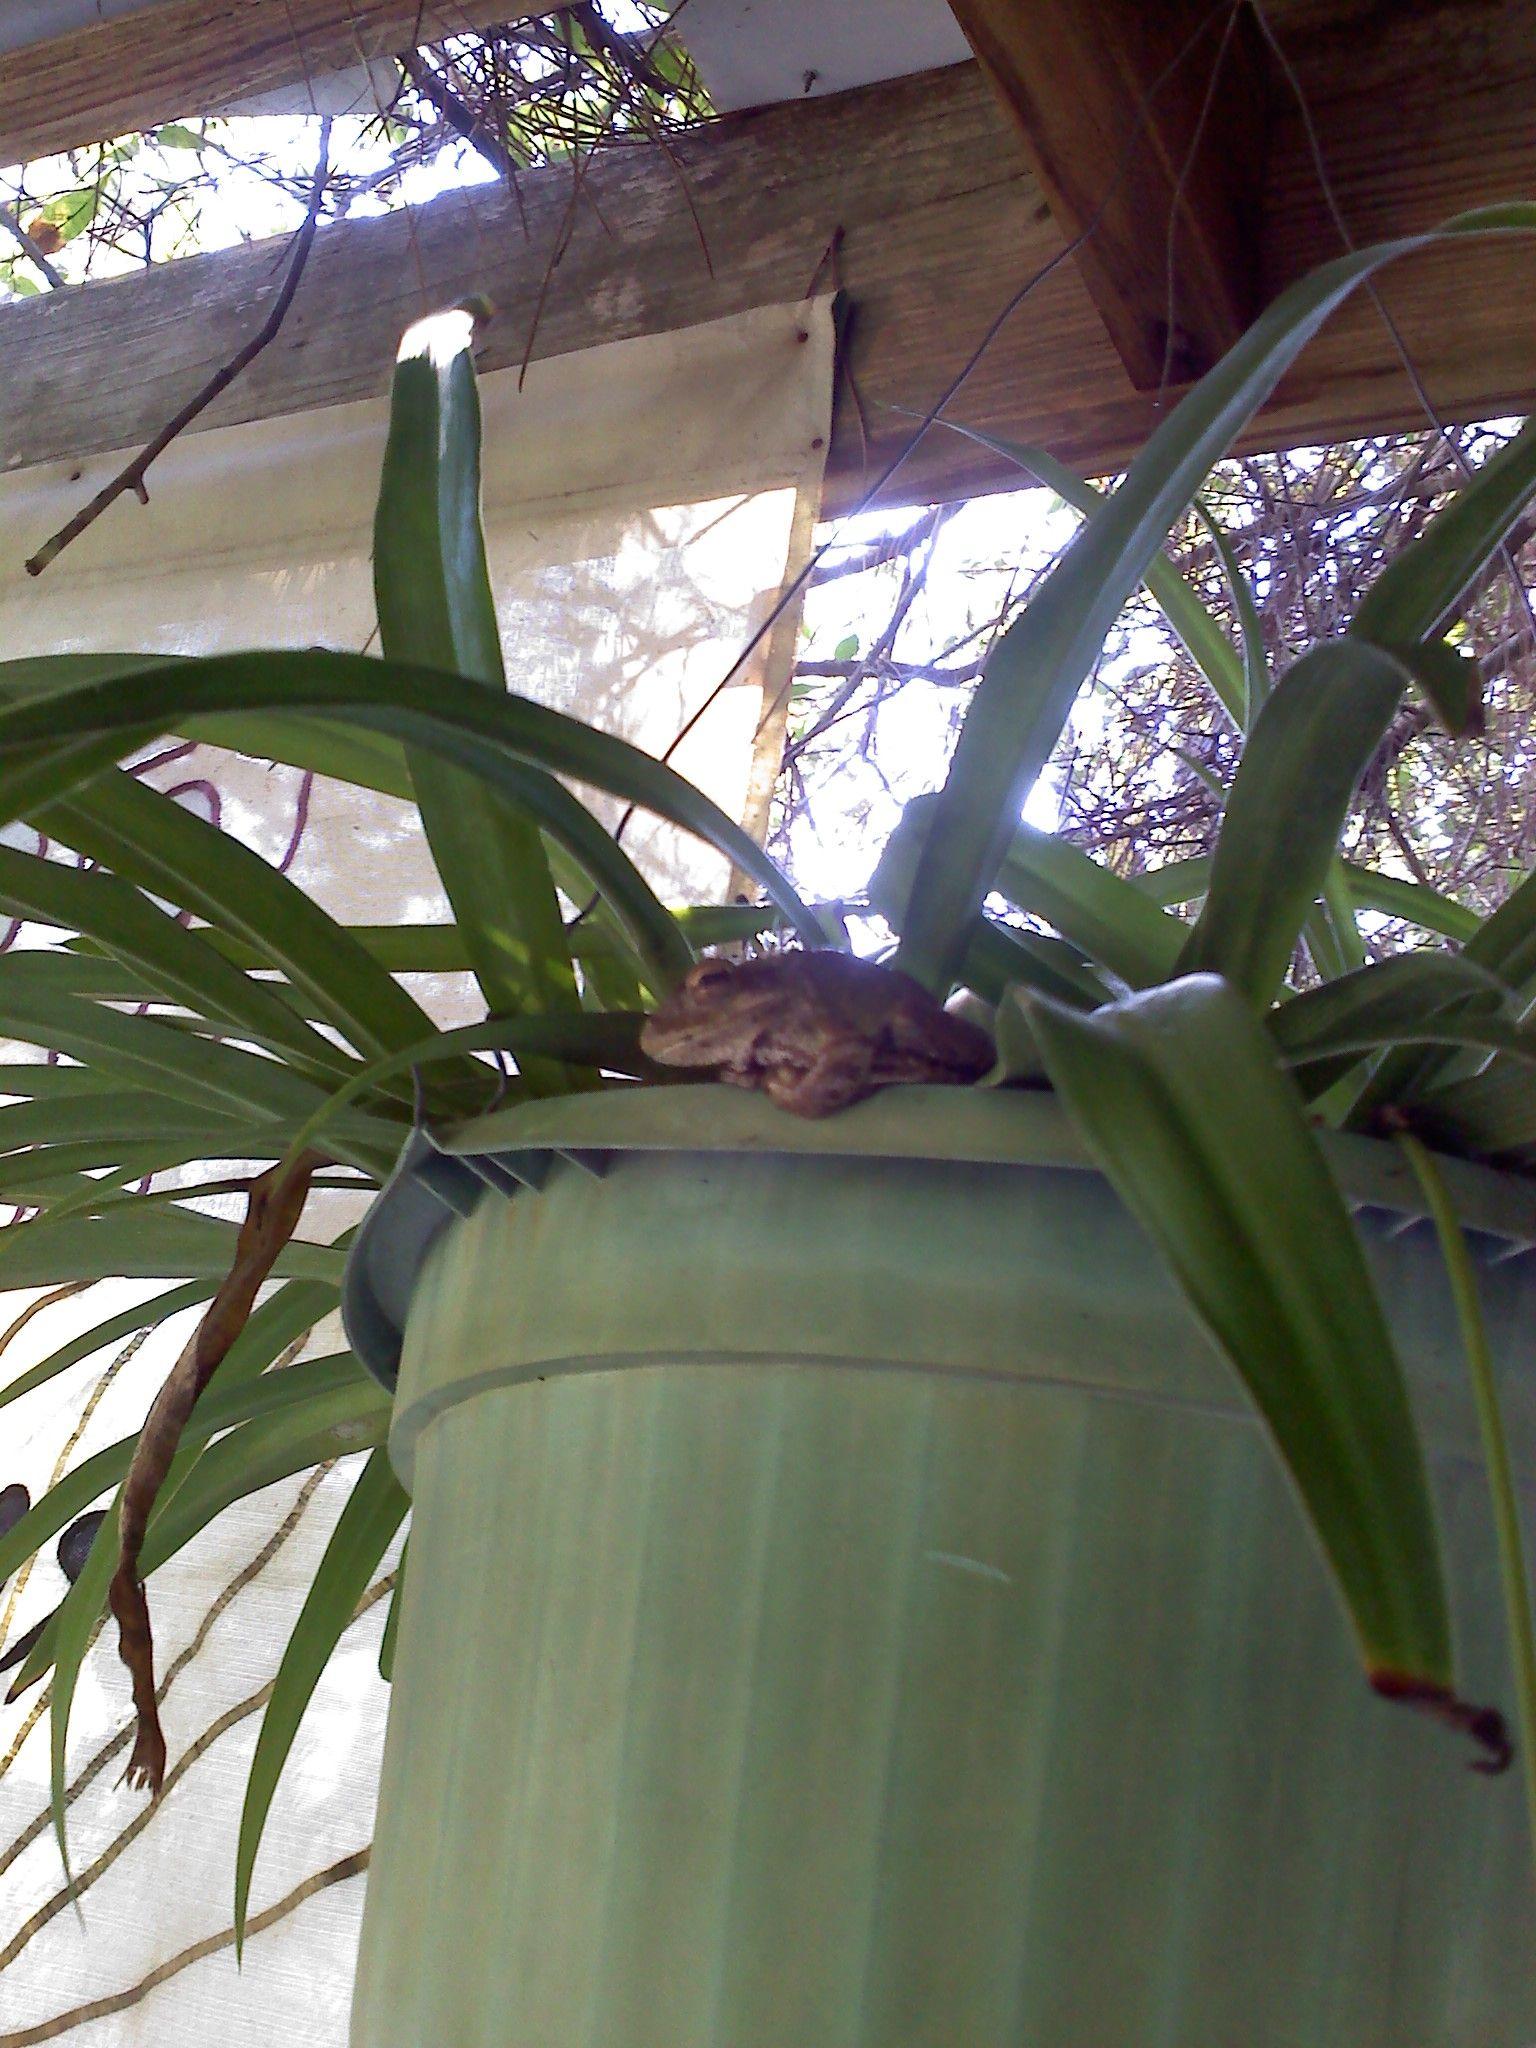 Frog in my potting shed | Garden, Plants, Potting shed